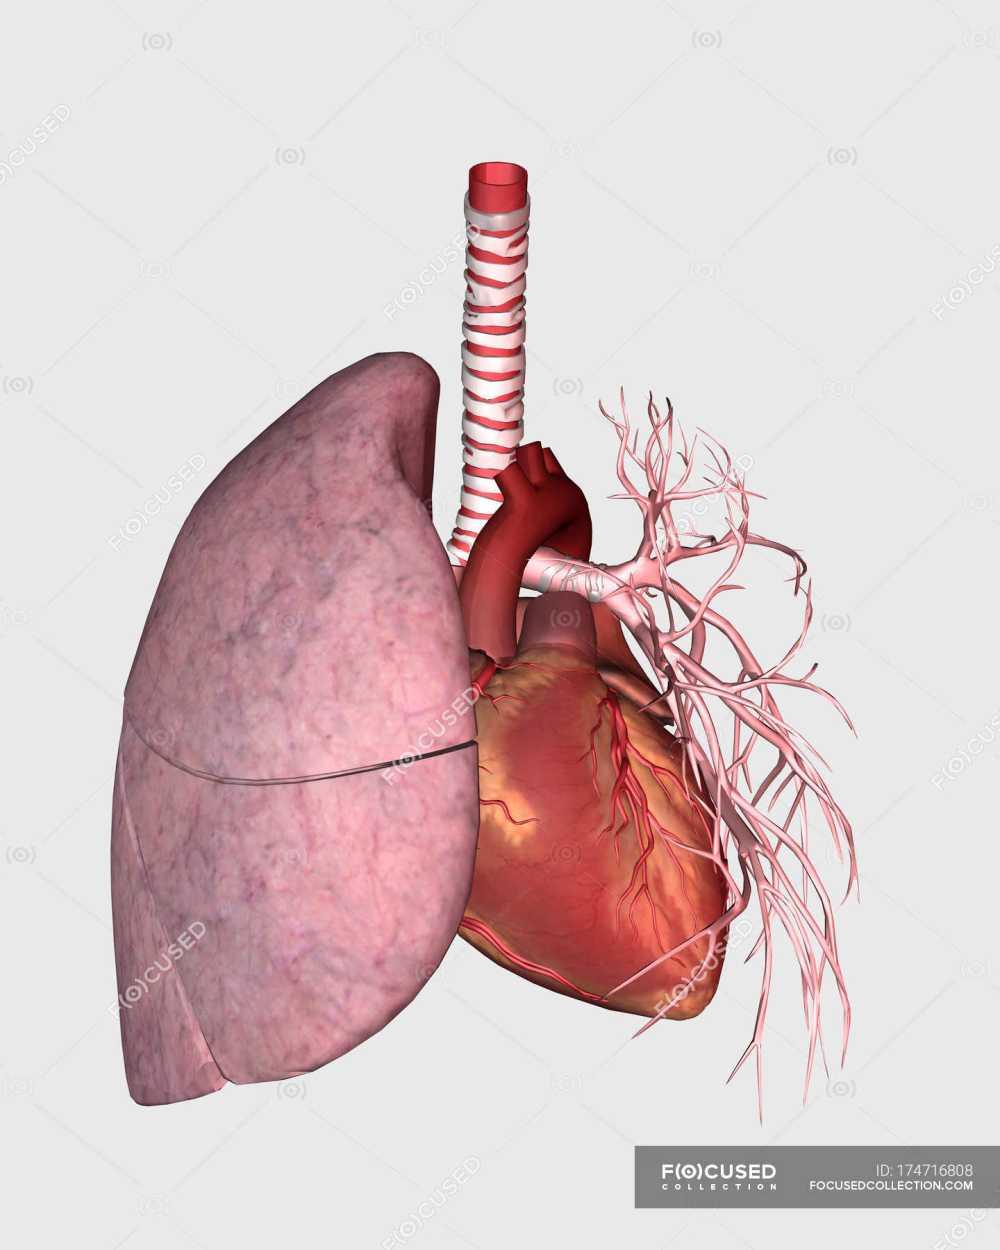 medium resolution of pulmonary circulation of human heart and lung stock photos